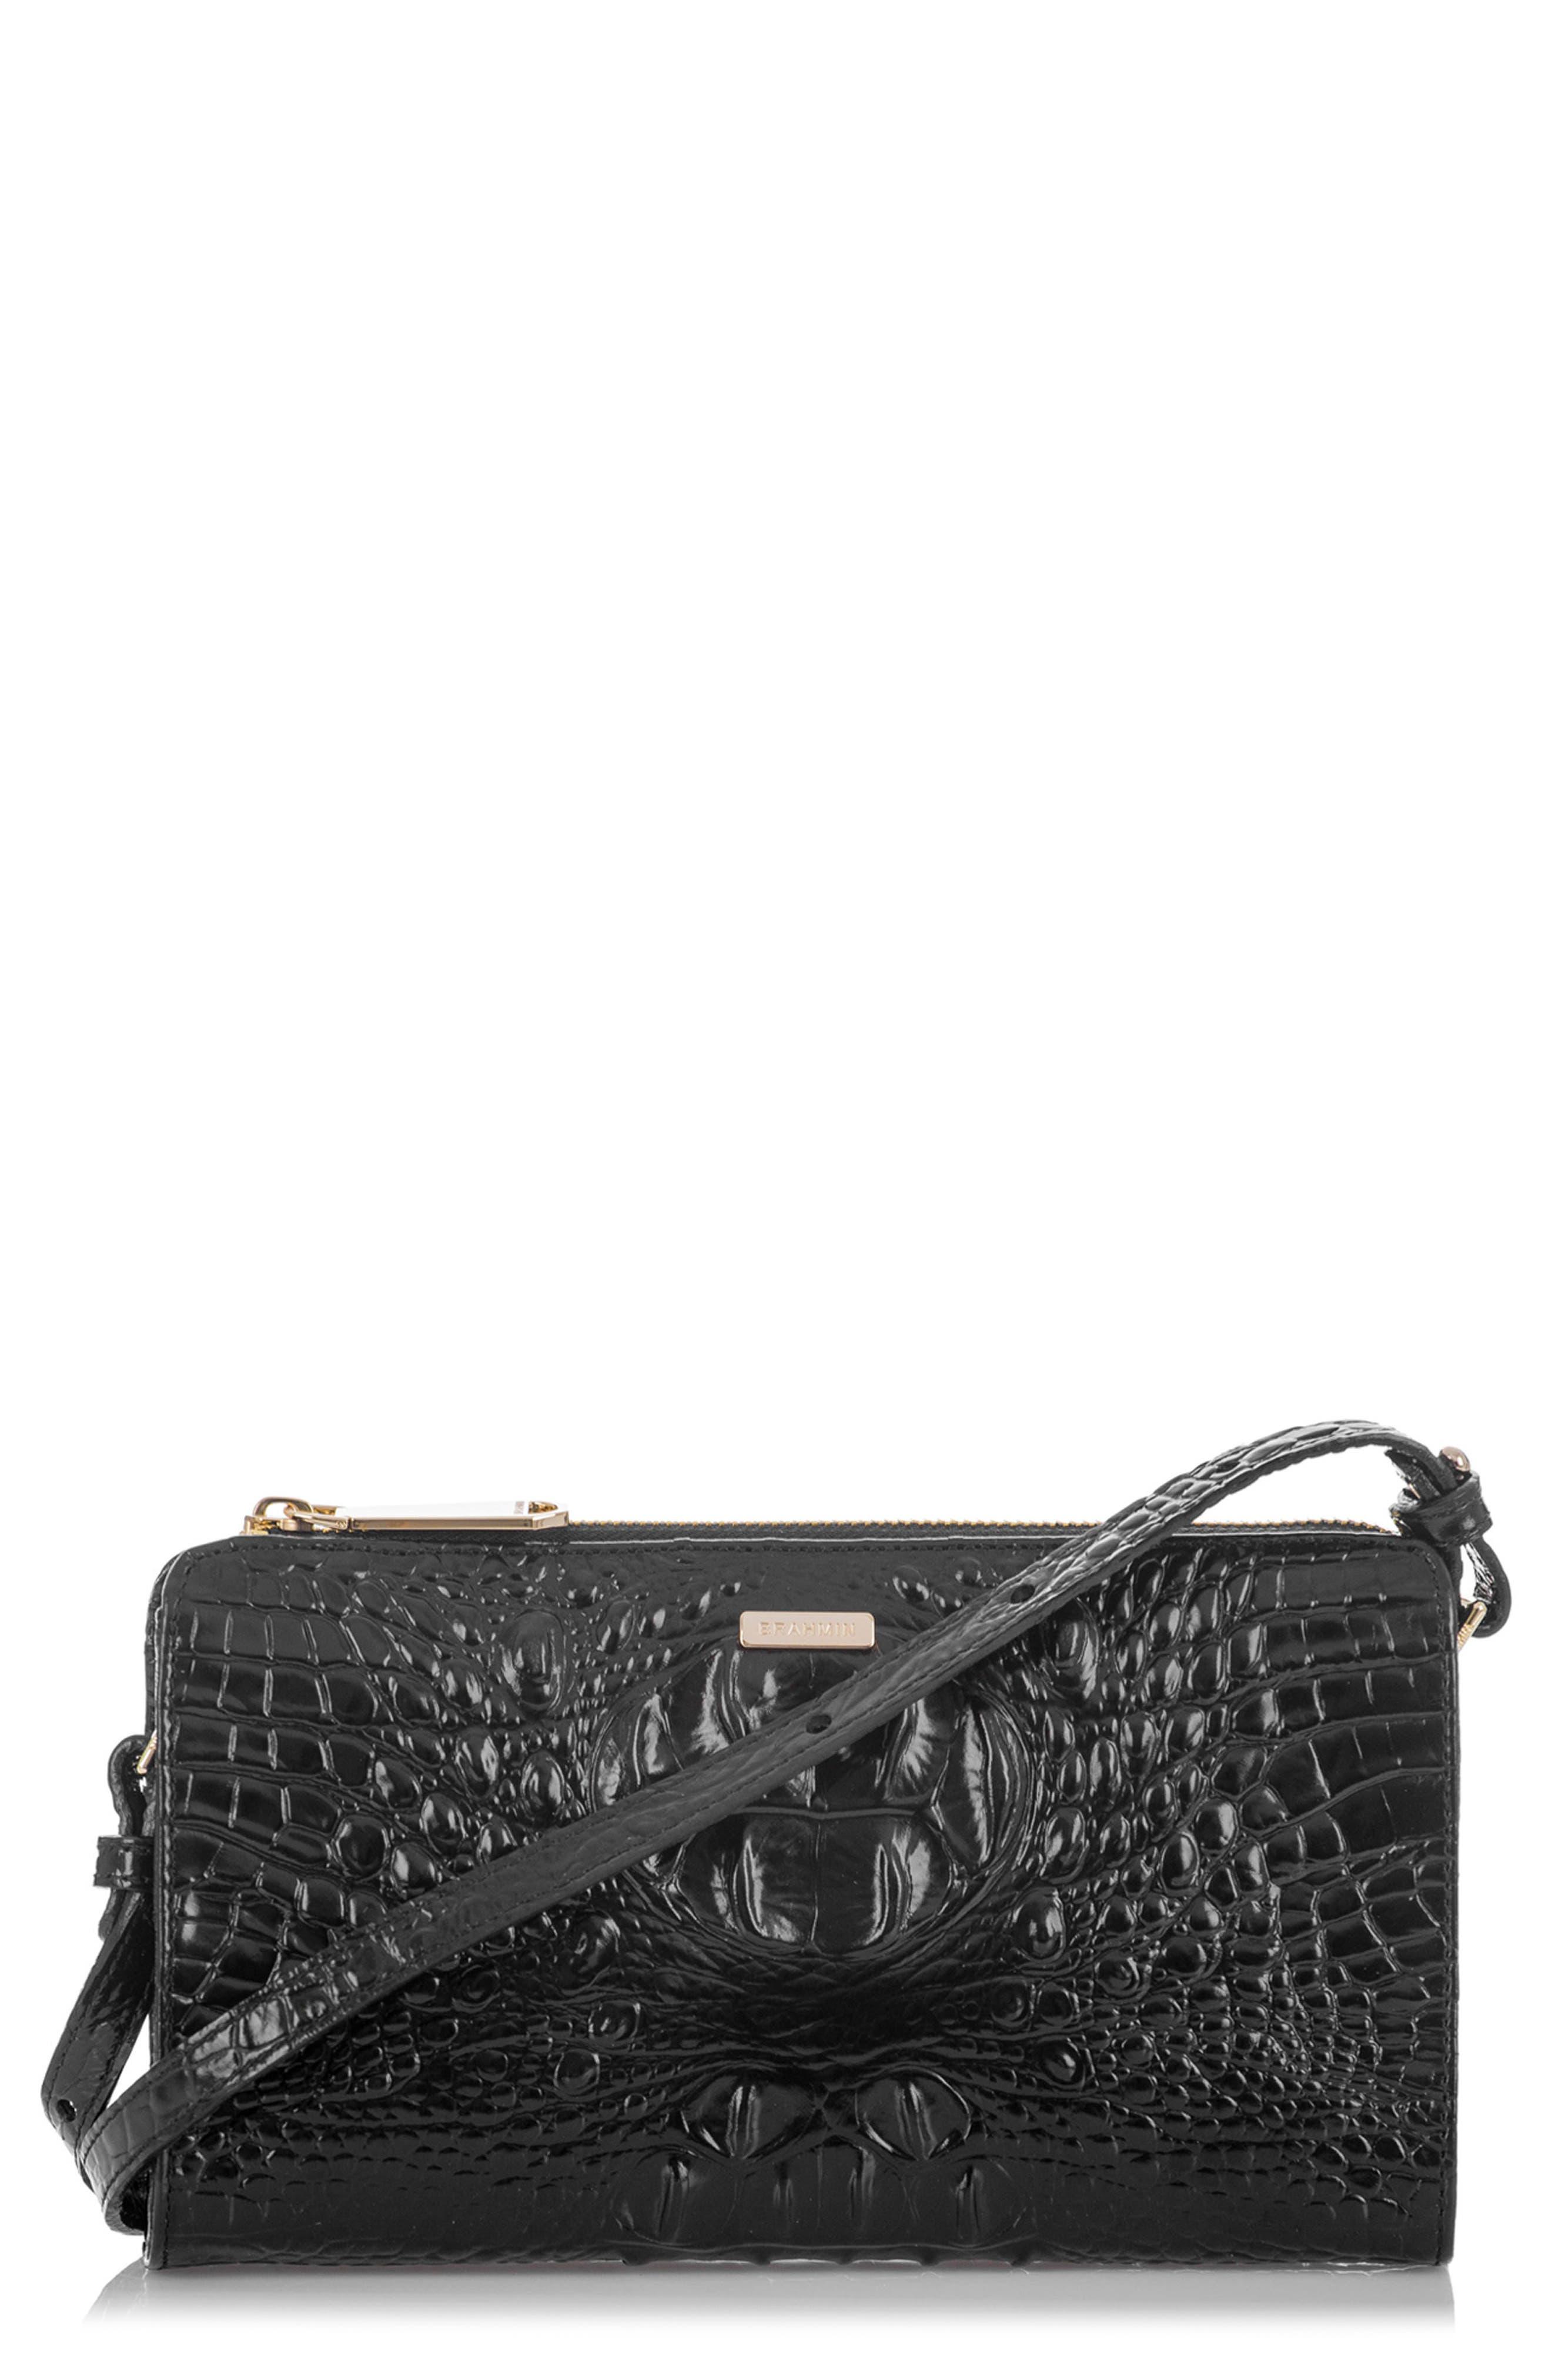 Sienna Leather Crossbody Bag,                             Main thumbnail 1, color,                             001